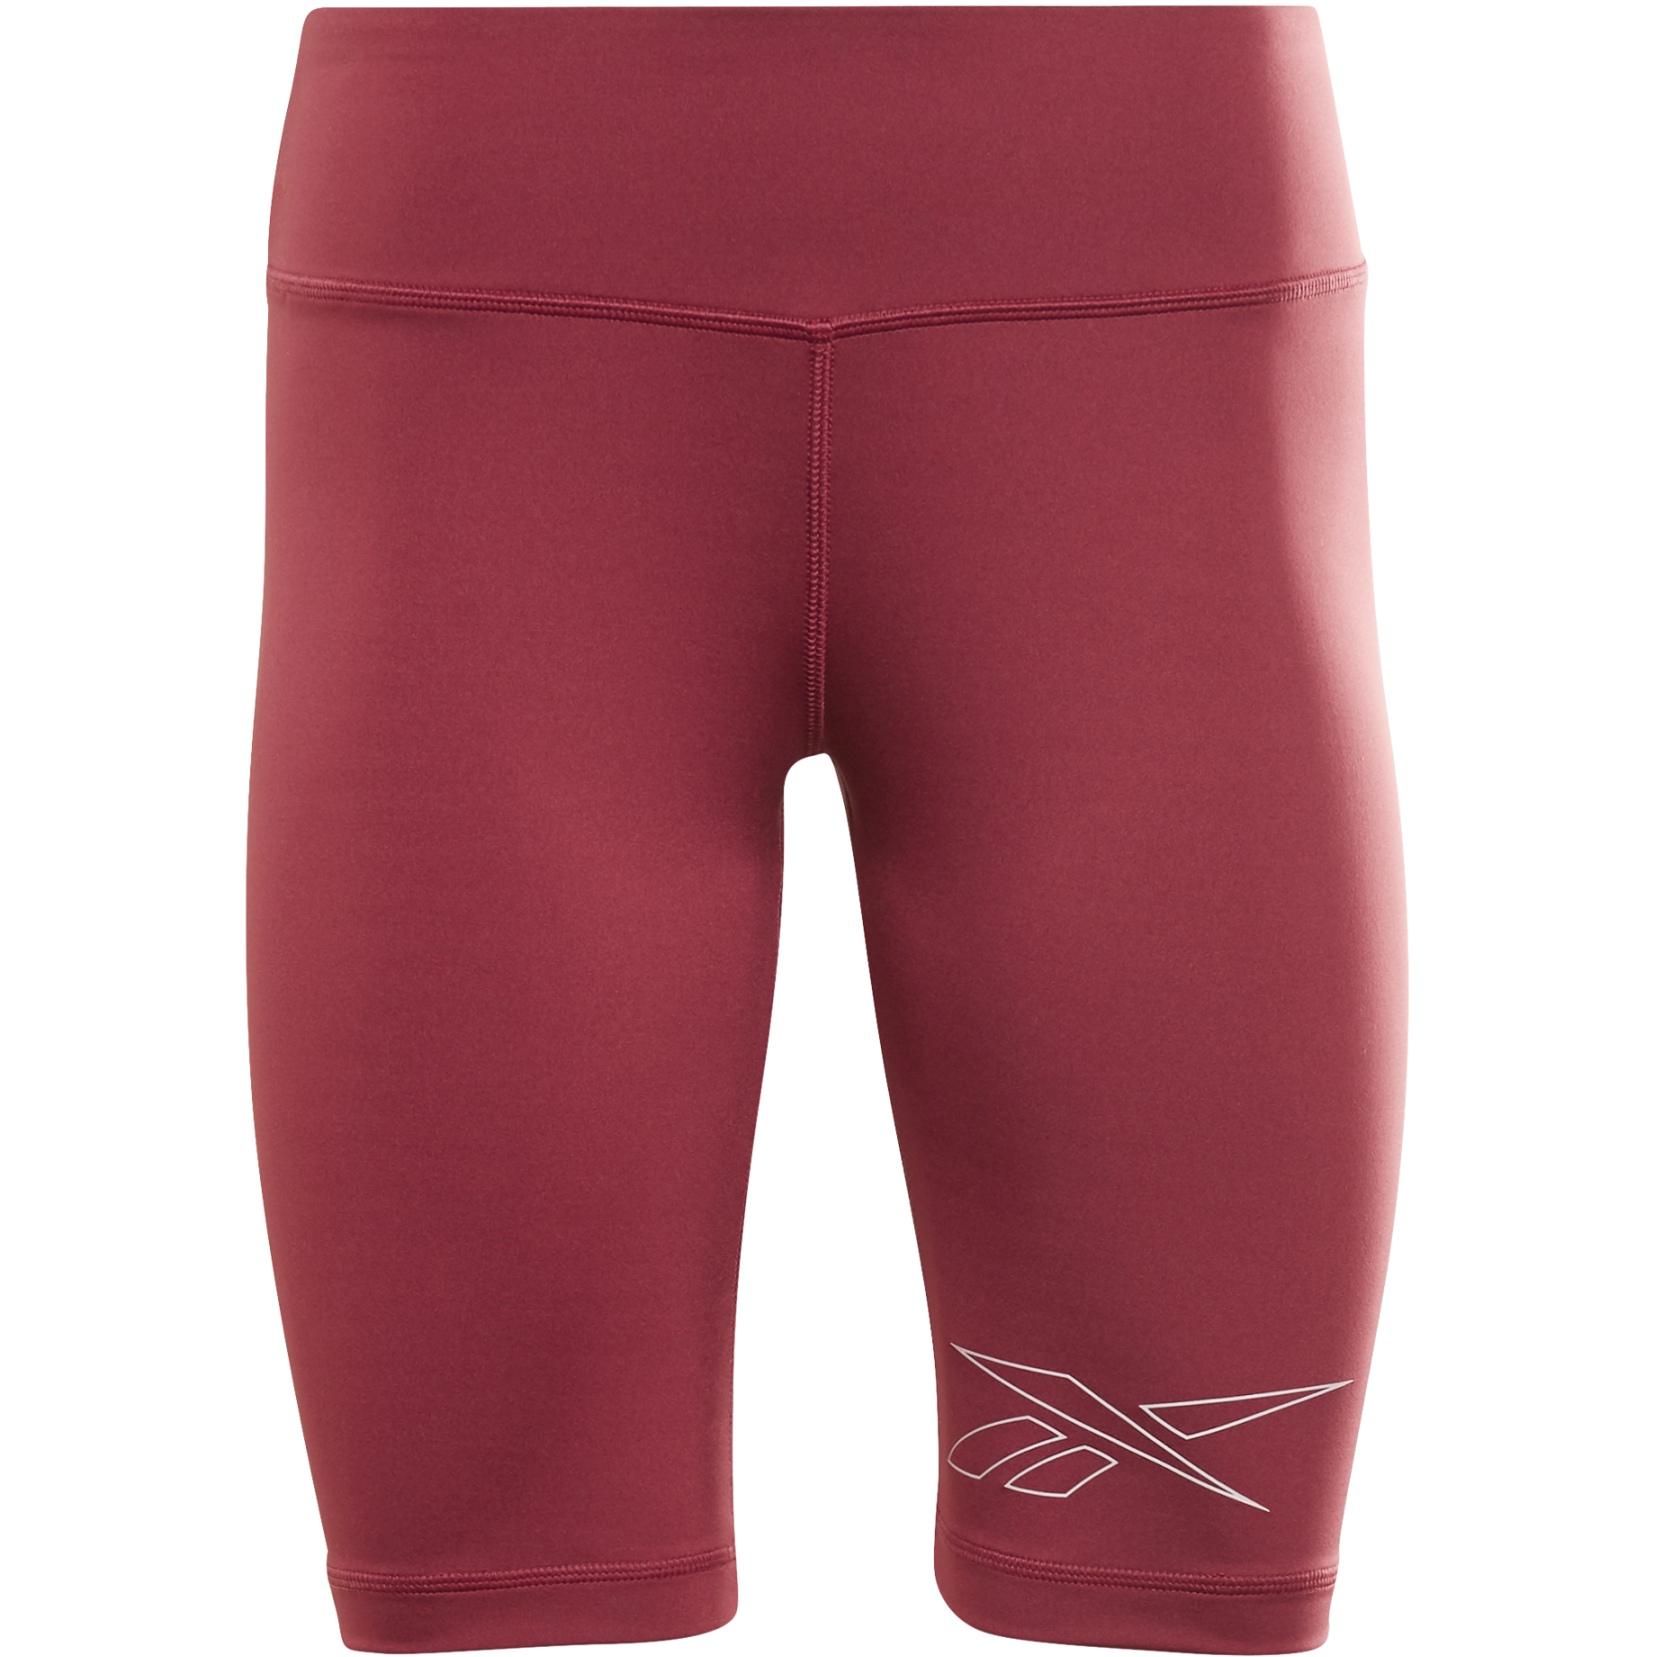 Reebok Piping Shorts for Women - punch berry